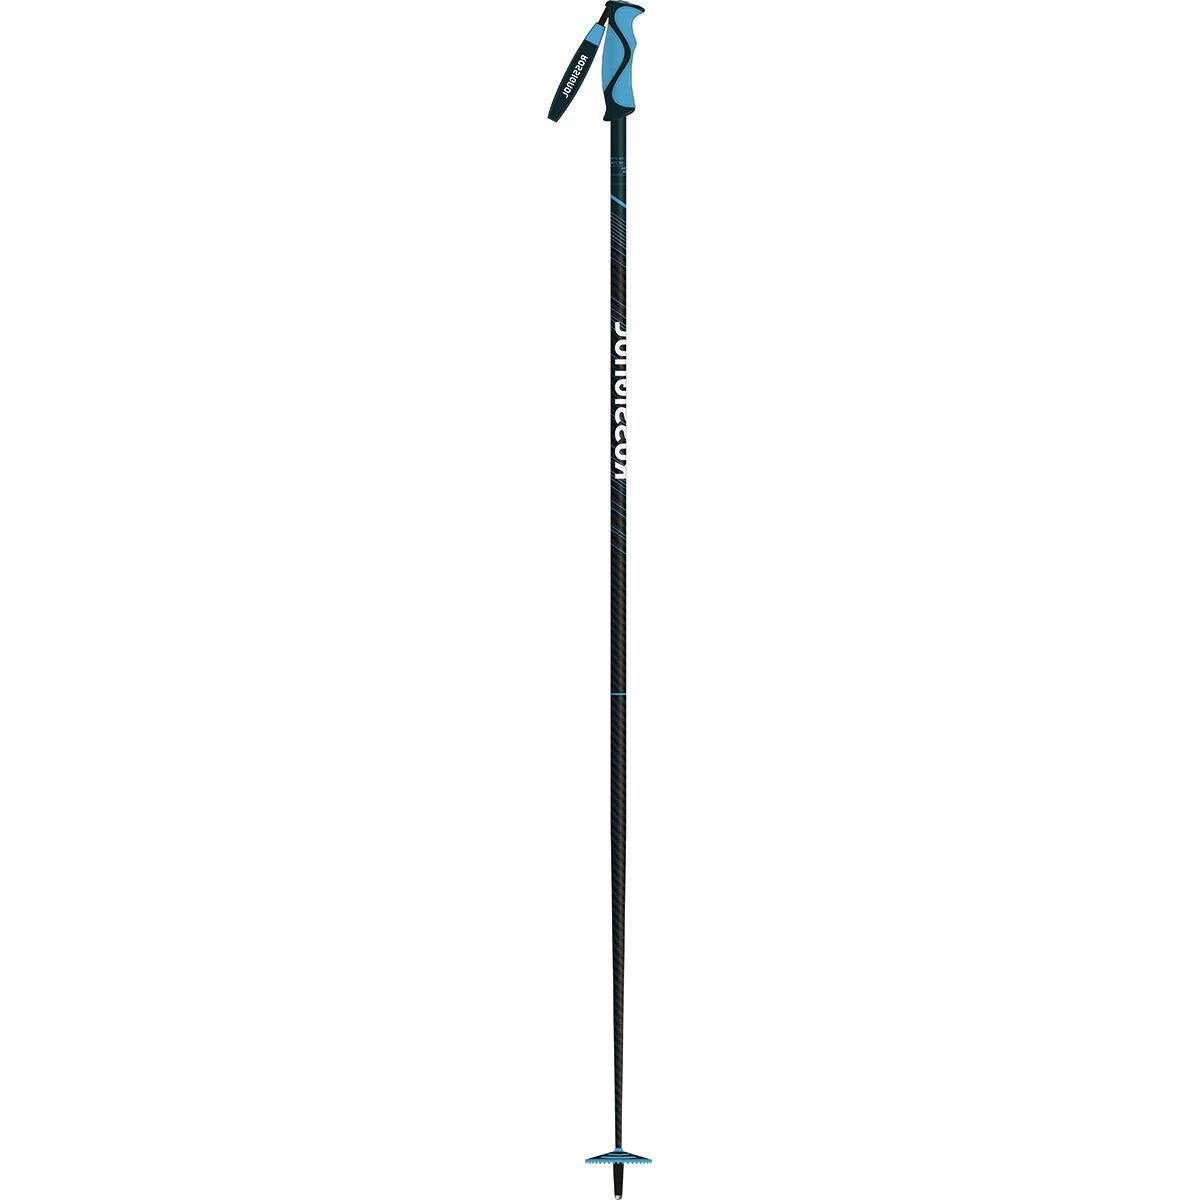 Rossignol Electra Carbon Ski Poles - Women's